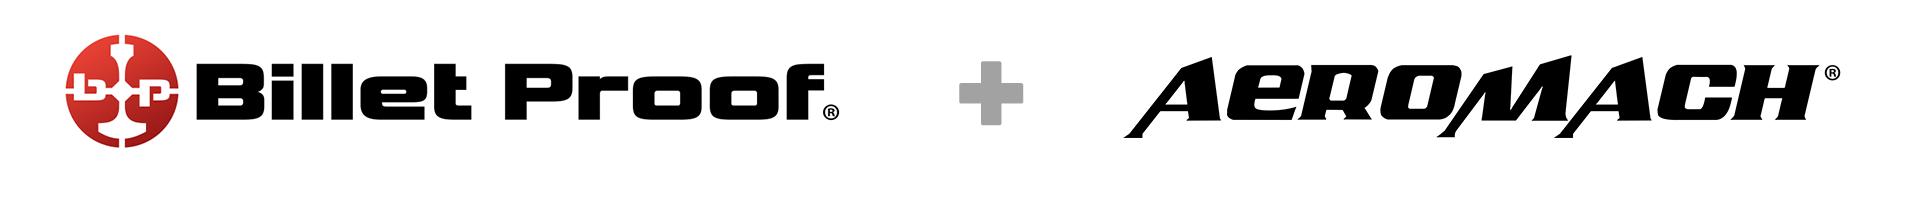 billet-proof-website-banner-aeromach-merger-1.png